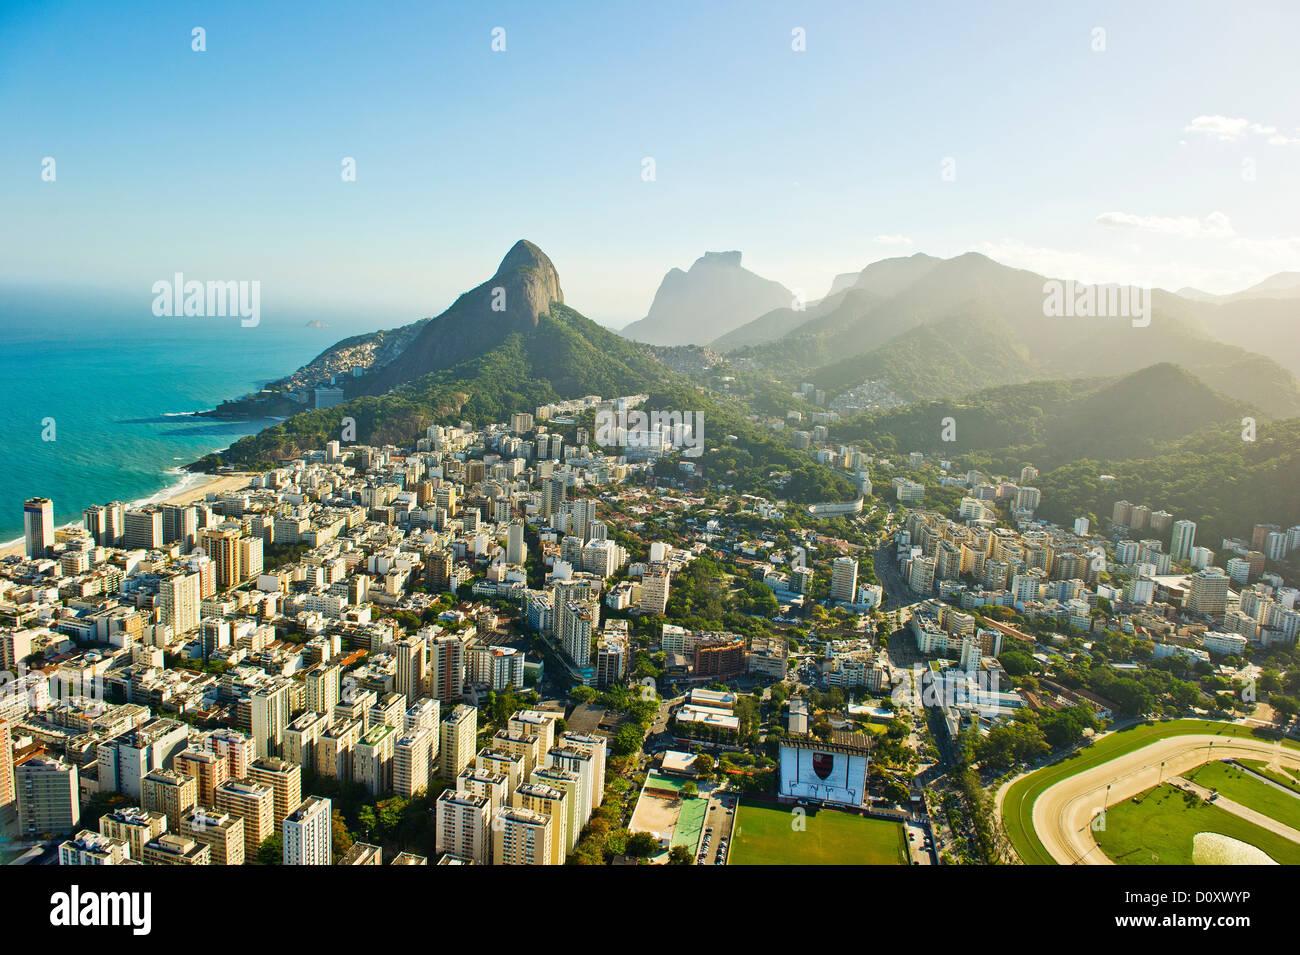 Vista aerea di Lagoa e Ipanema, a Rio de Janeiro in Brasile Foto Stock